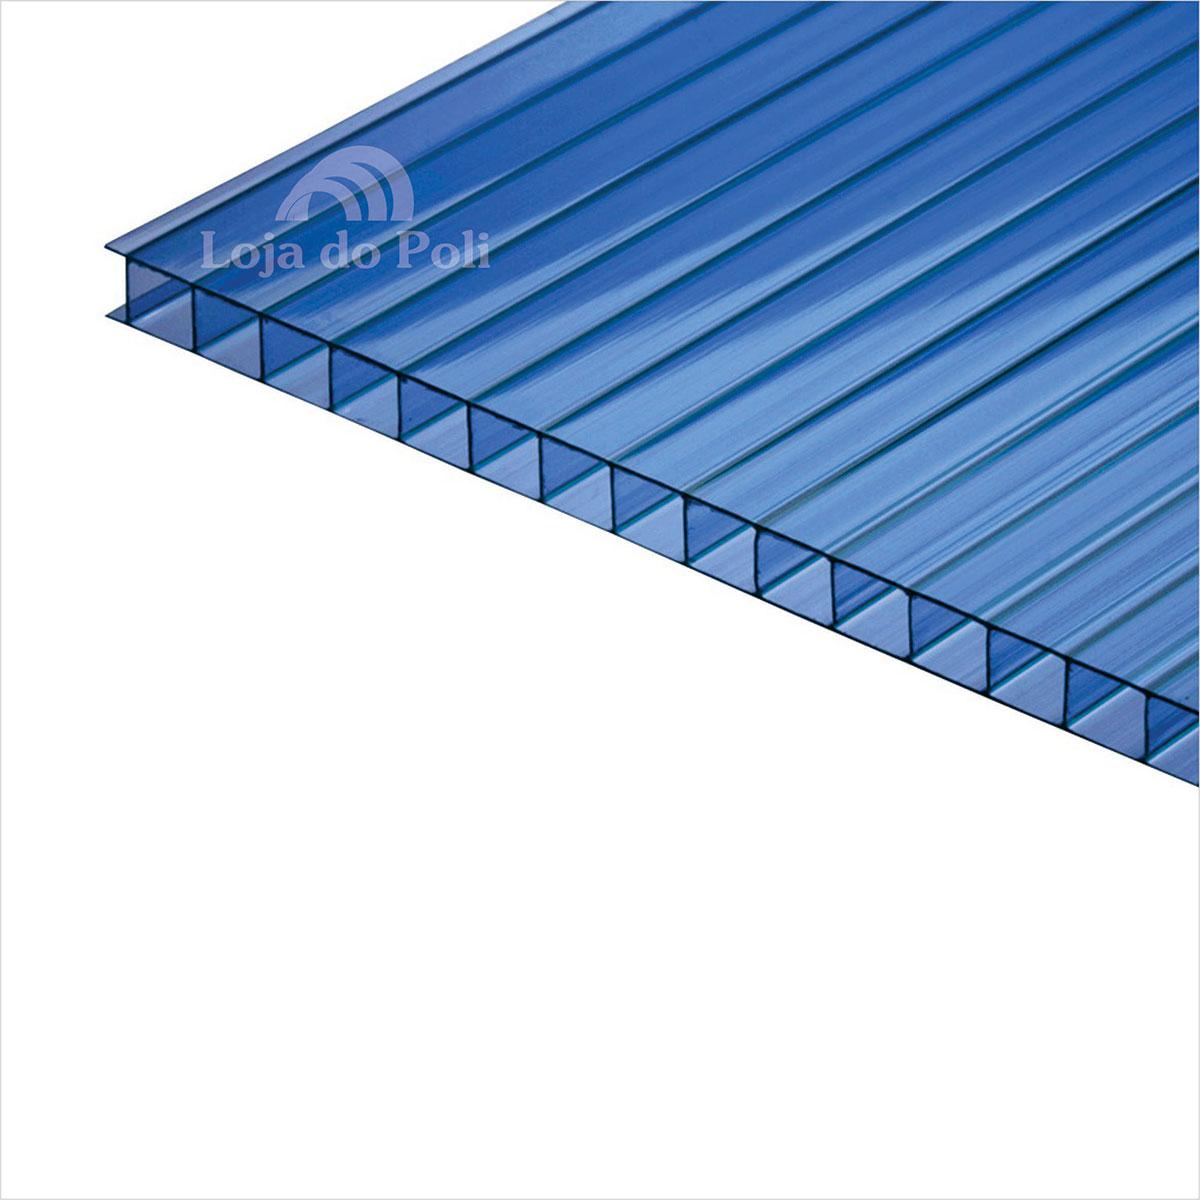 Chapa Policarbonato Alveolar Azul 10mm 2,1x6,0m